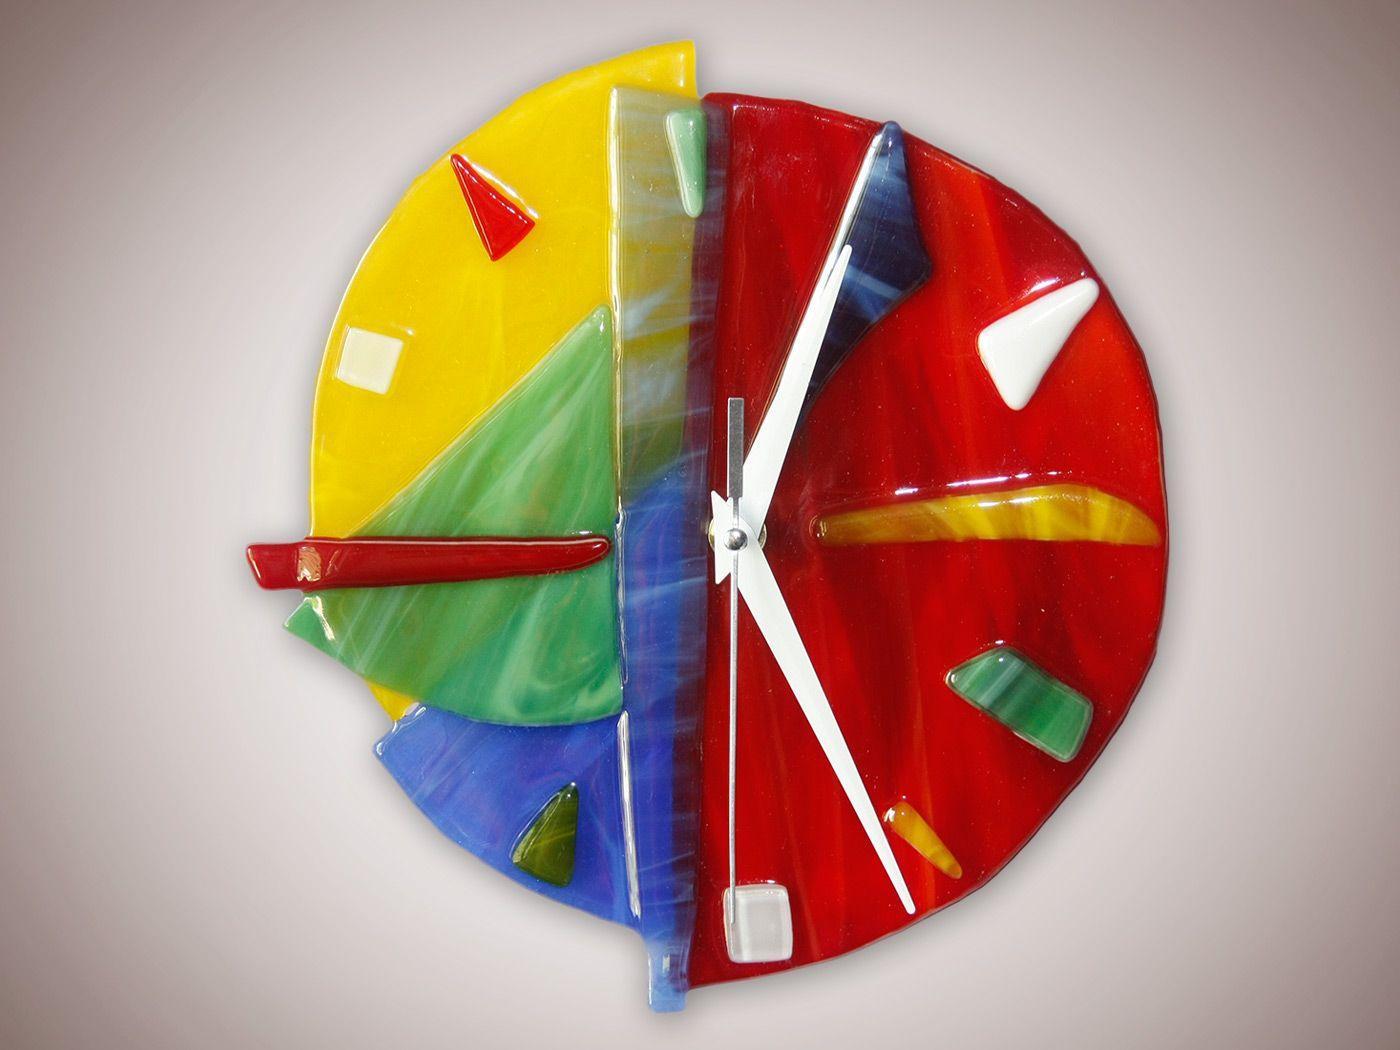 Stenska steklena ura, pol-ART